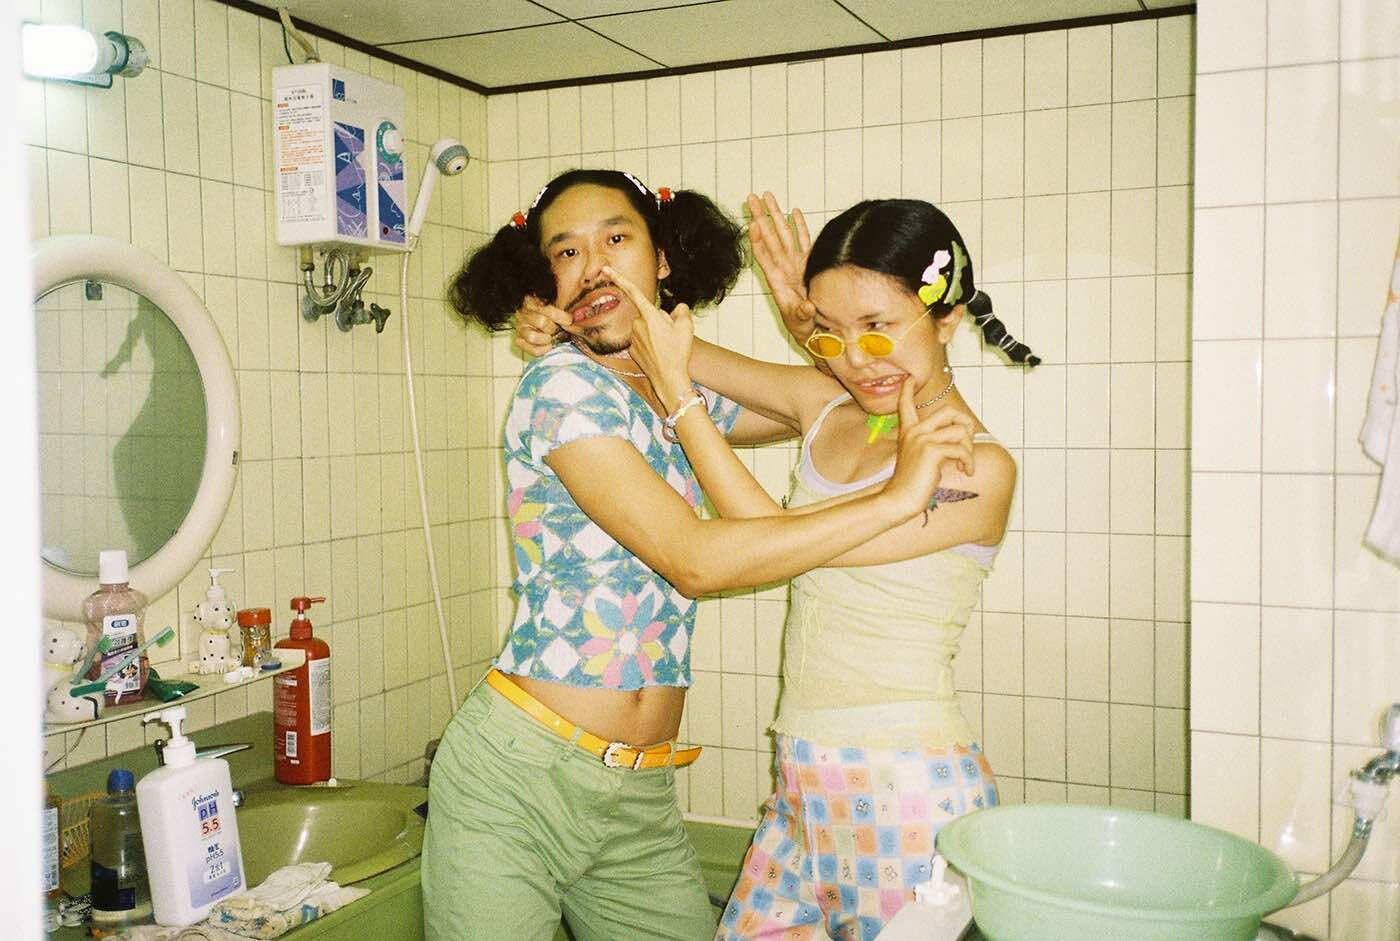 罗洋,《Chen Nienying & Ho Tingshao》,2019年,香港,胶片,图片由艺术家提供。